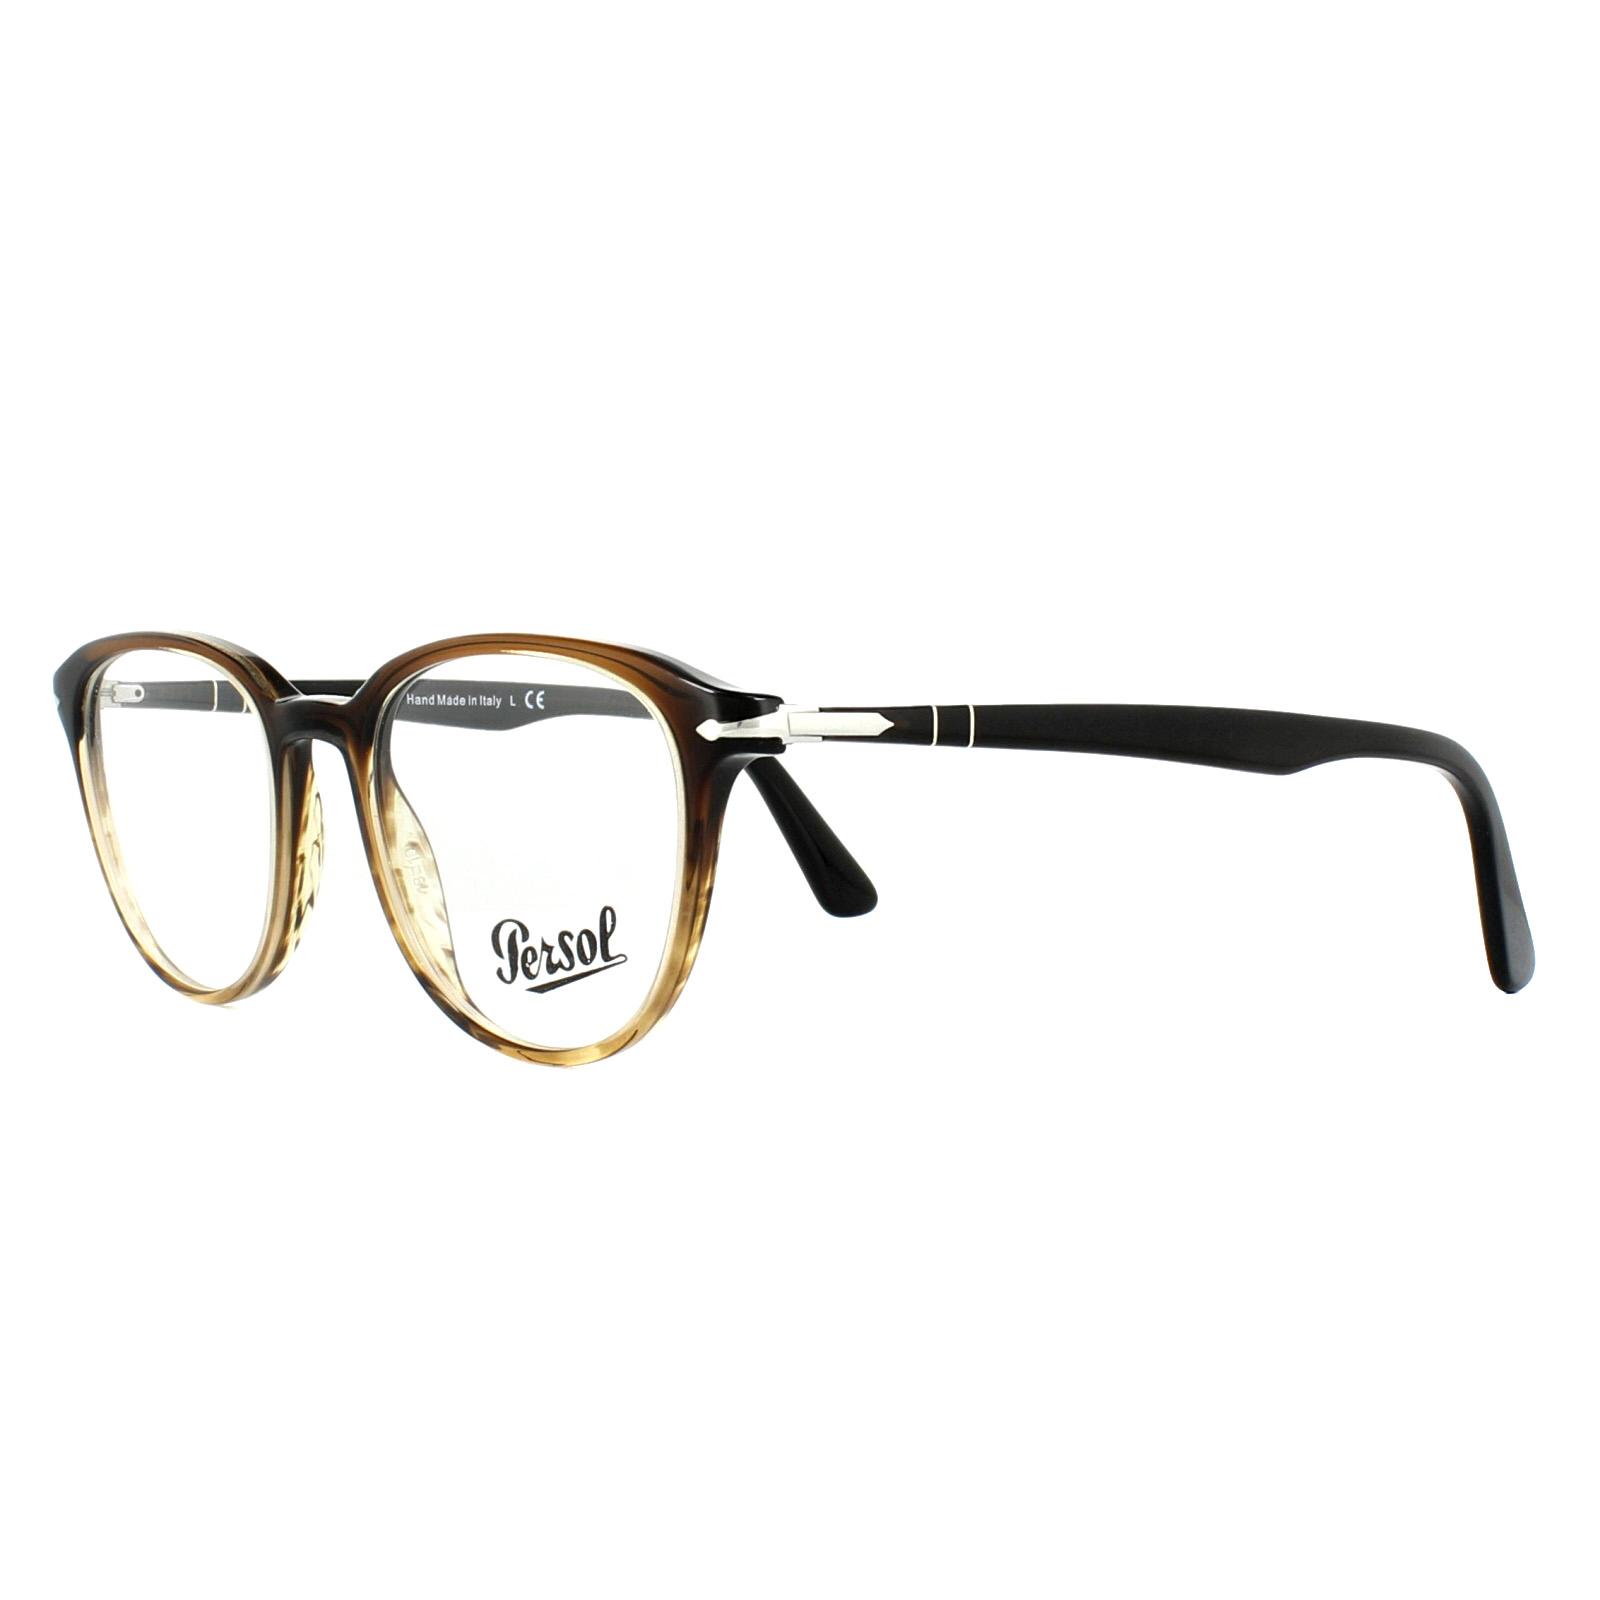 5966b5113c843 Sentinel Persol Glasses Frames PO3176V 1026 Black Gradient Striped Brown 48mm  Mens